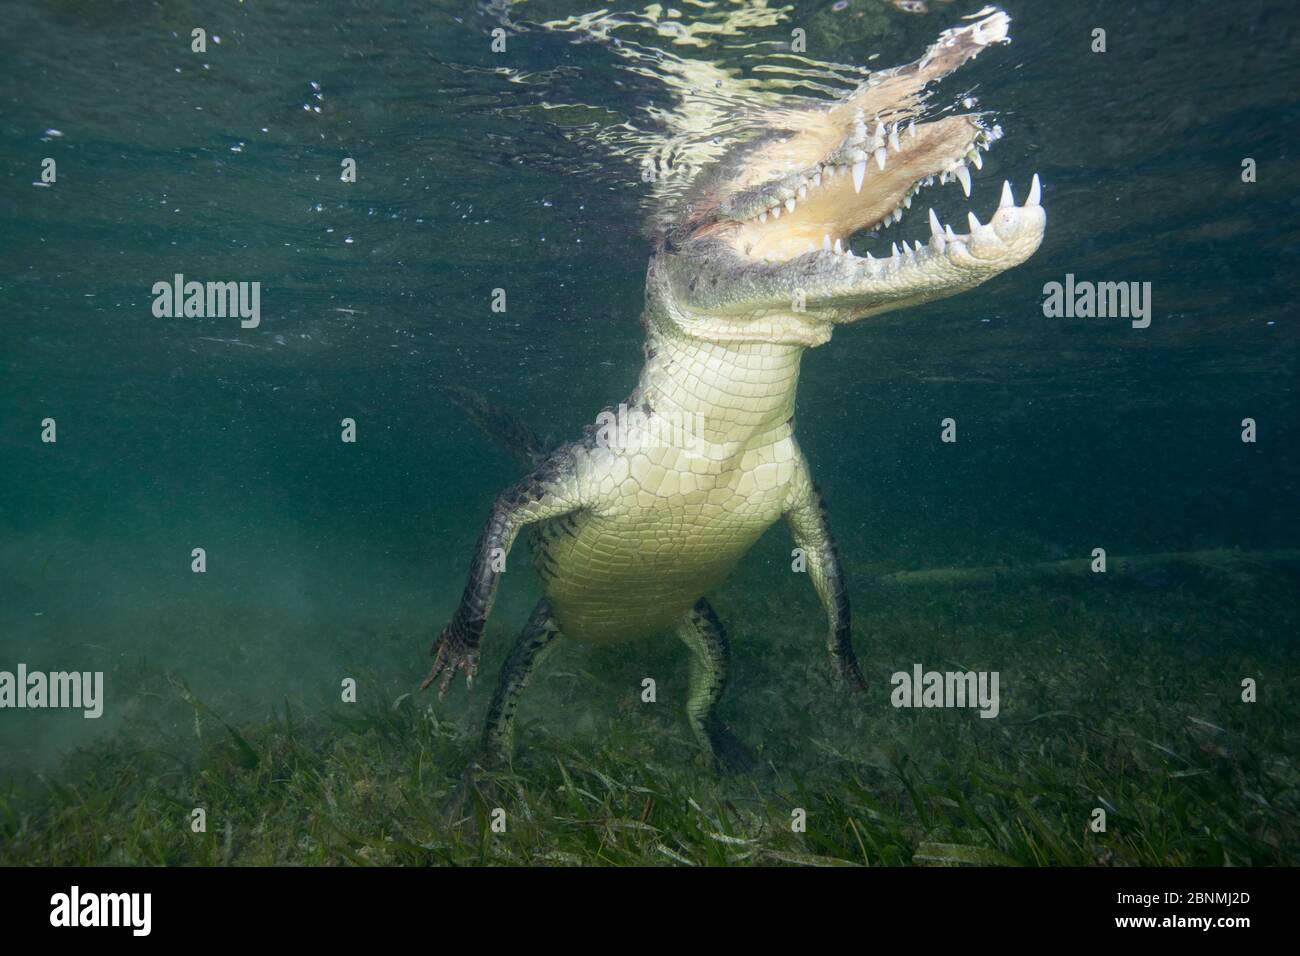 Amerikanisches Krokodil (Crocodylus acutus), das zum Atmen auftauchbar ist, Banco Chinchorro Biosphärenreservat, Karibik, Mexiko Stockfoto